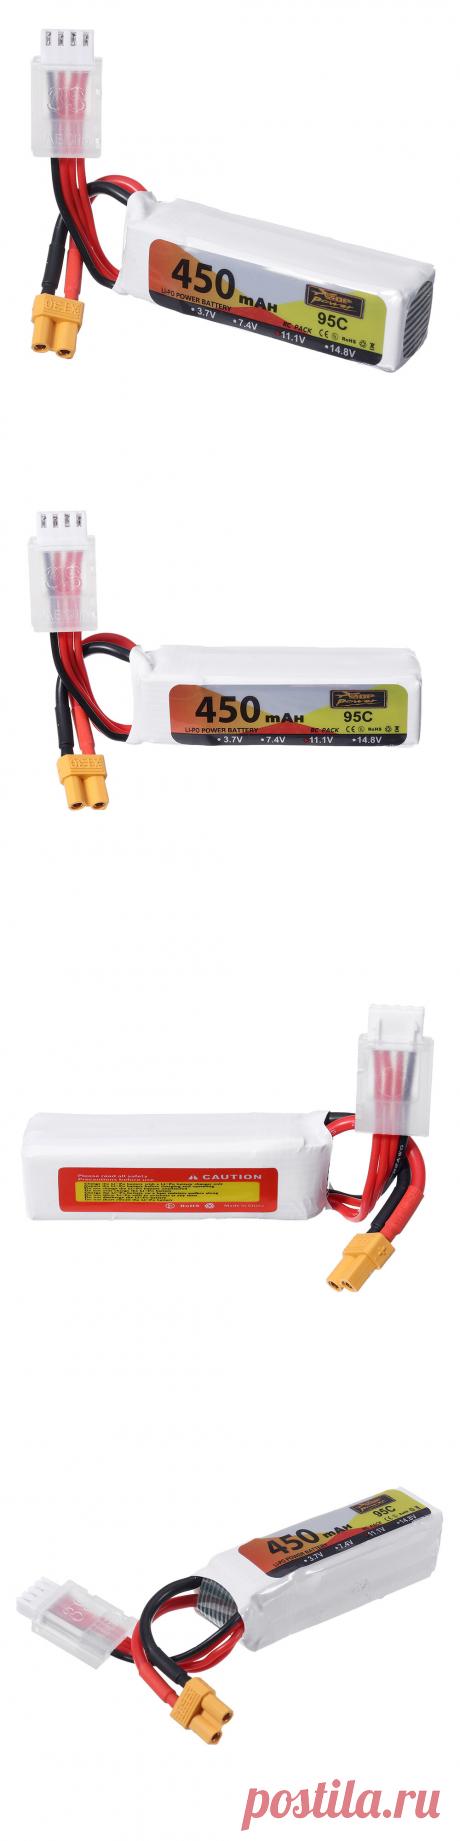 zop power 11.1v 450mah 95c 3s lipo battery xt30 plug for 90-150 sizes multirotor fpv drone Sale - Banggood.com